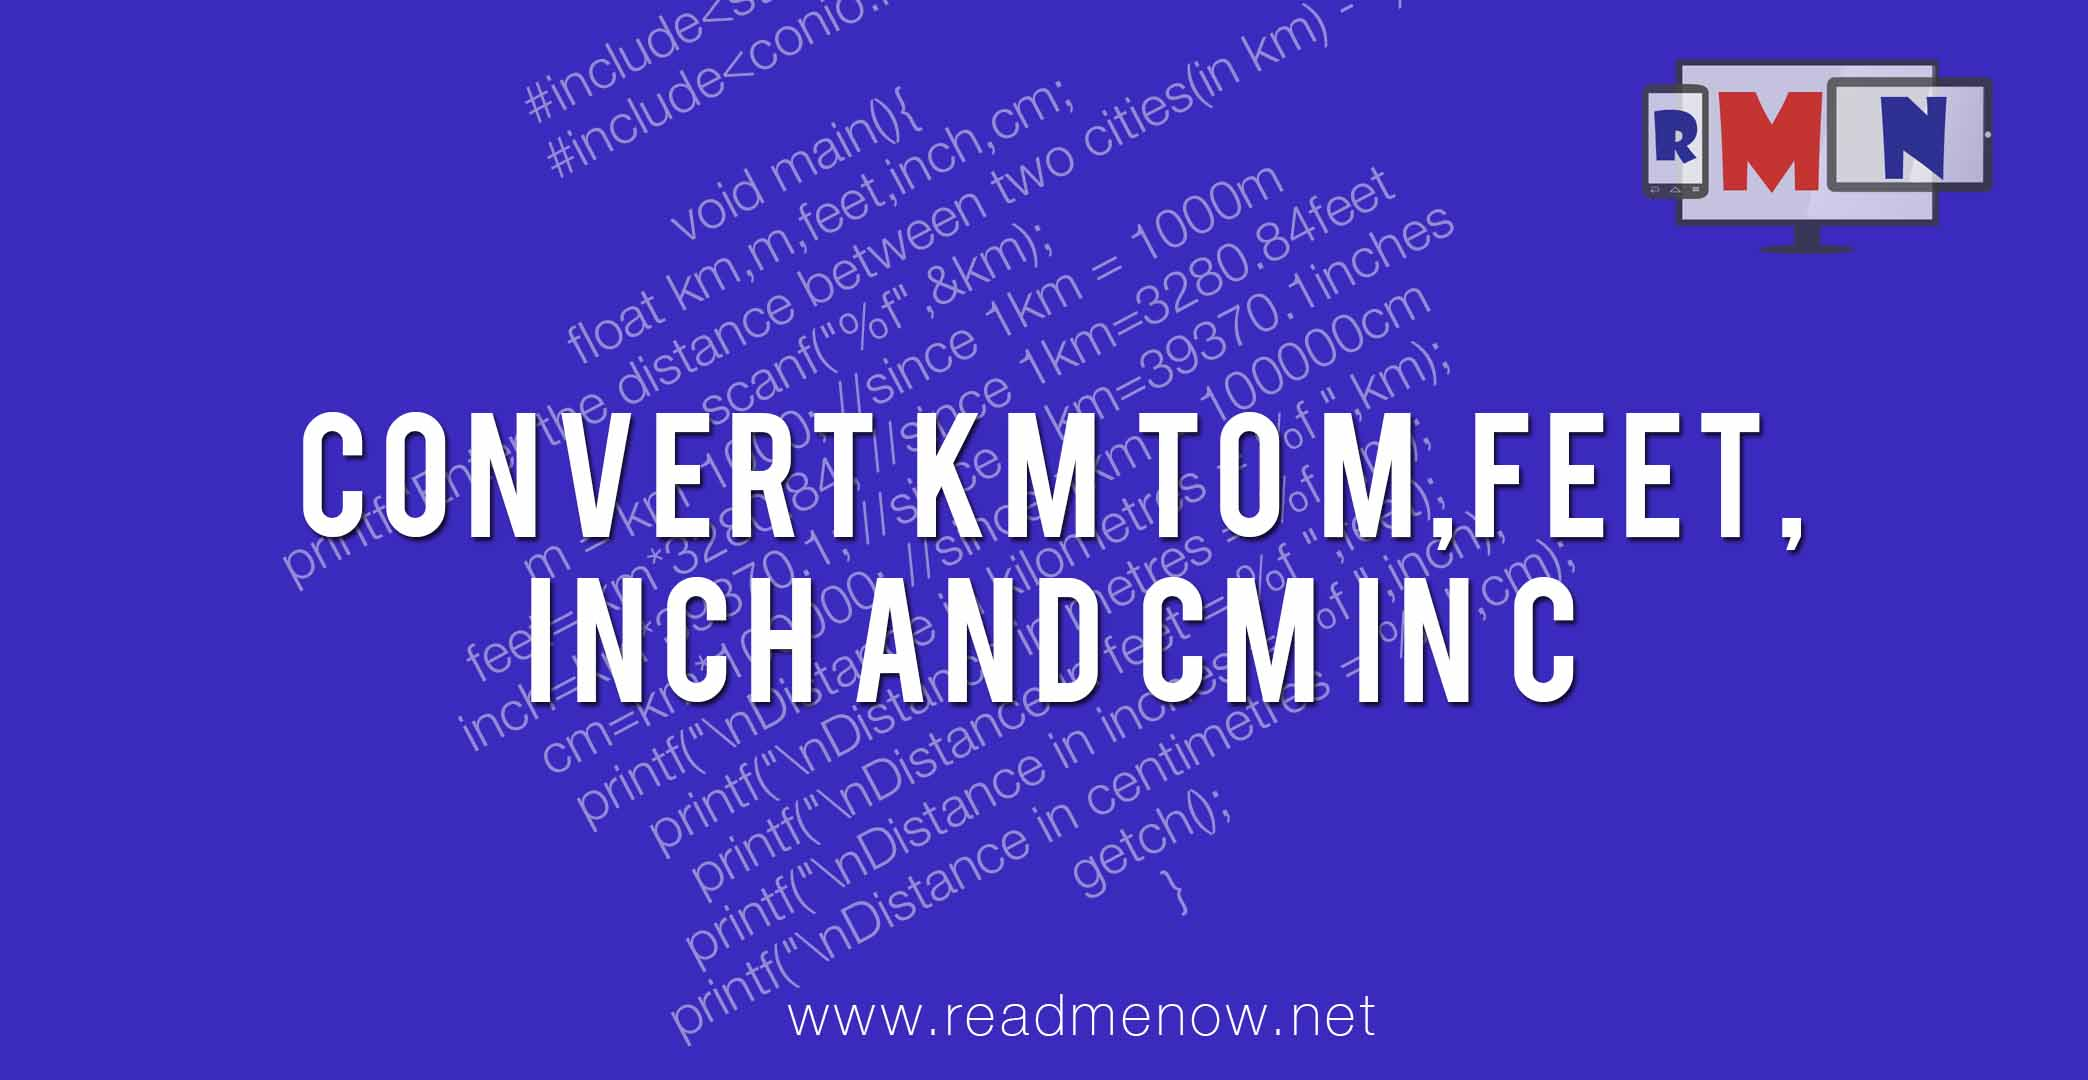 Convert km to mfeetinch and cm in c readmenow nvjuhfo Choice Image